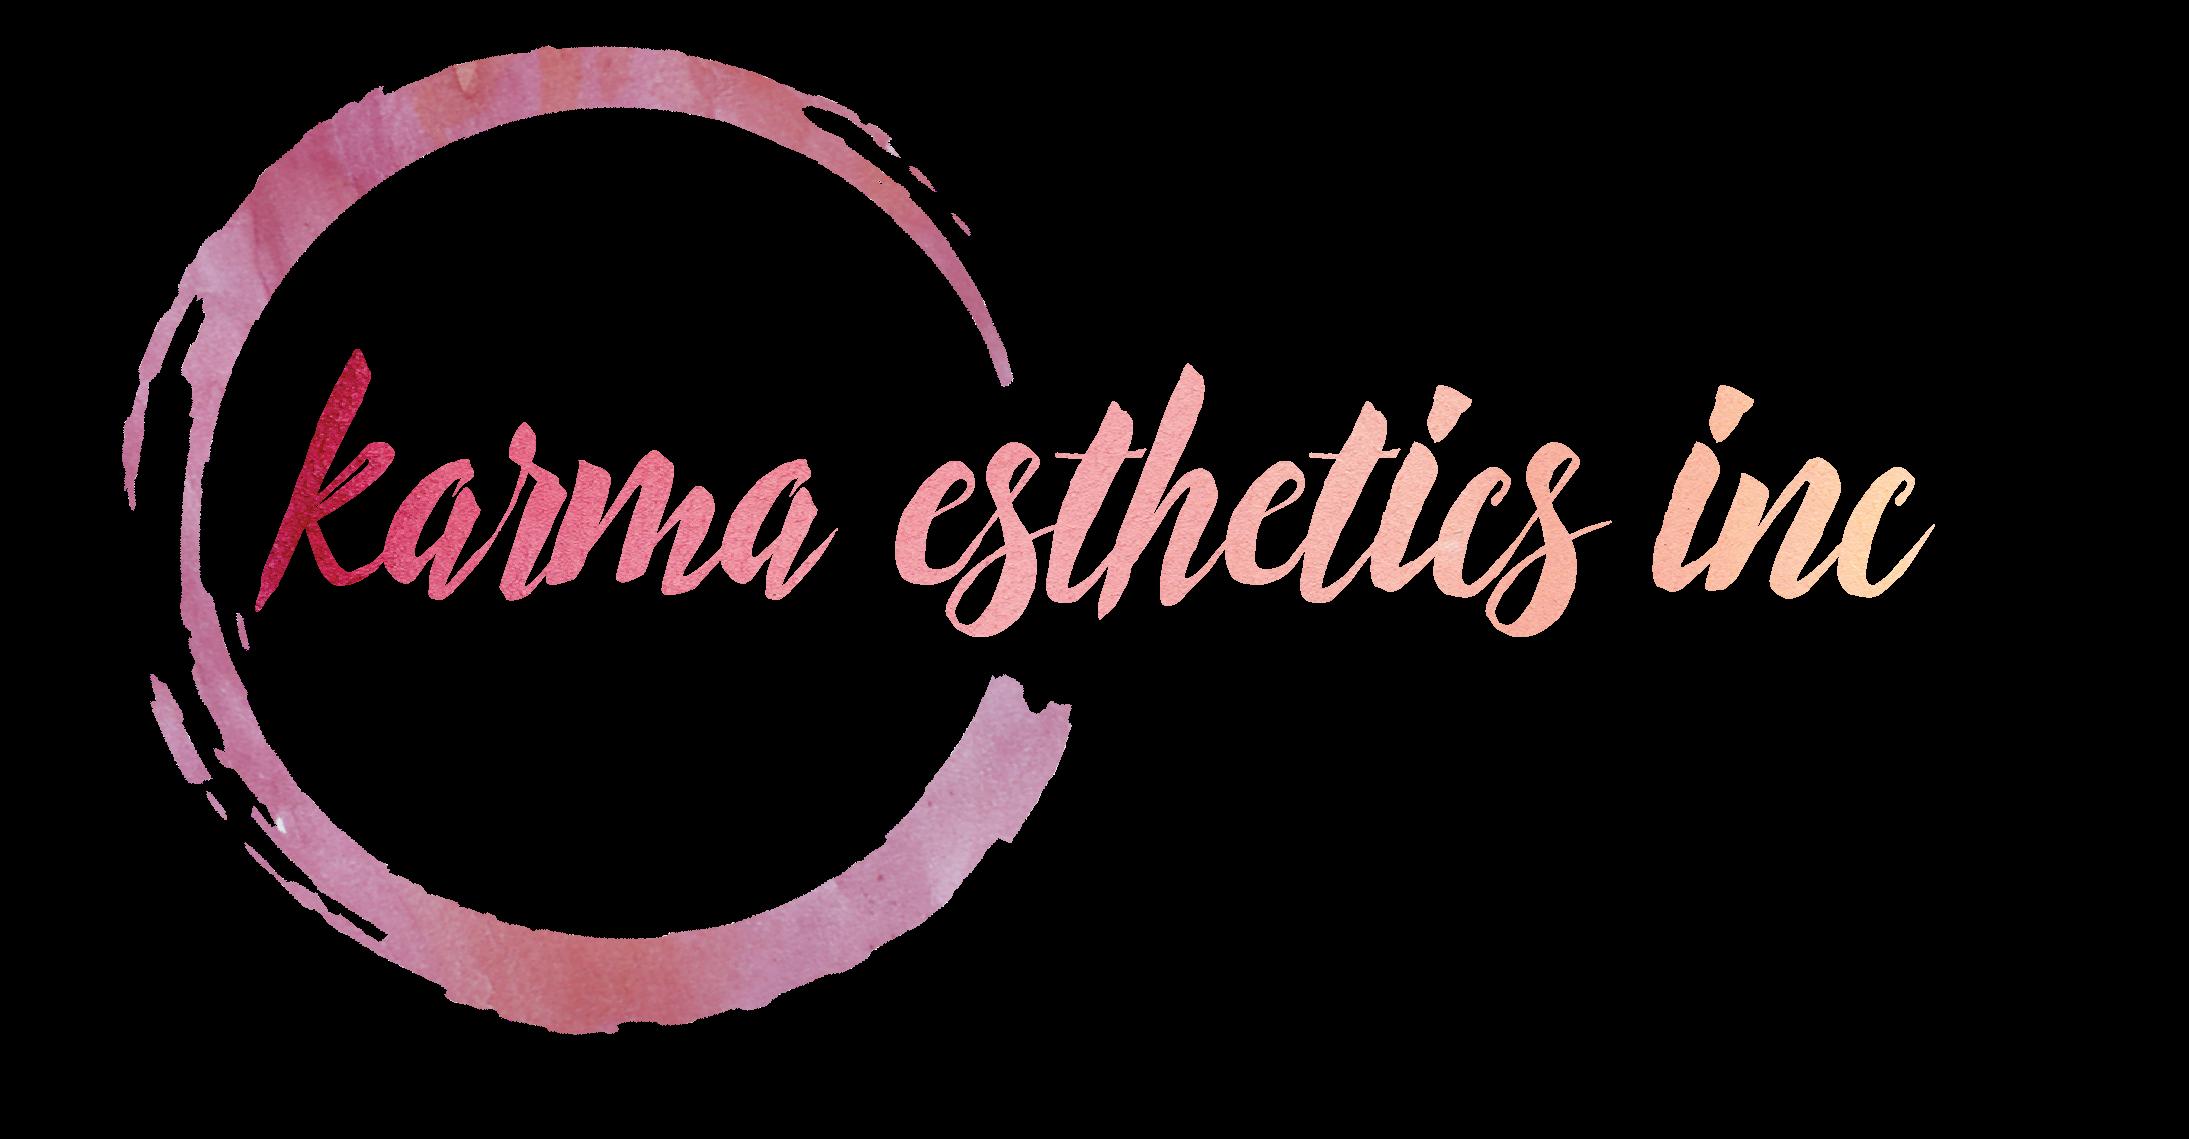 Home karma esthetics inc. Eyelashes clipart esthetician